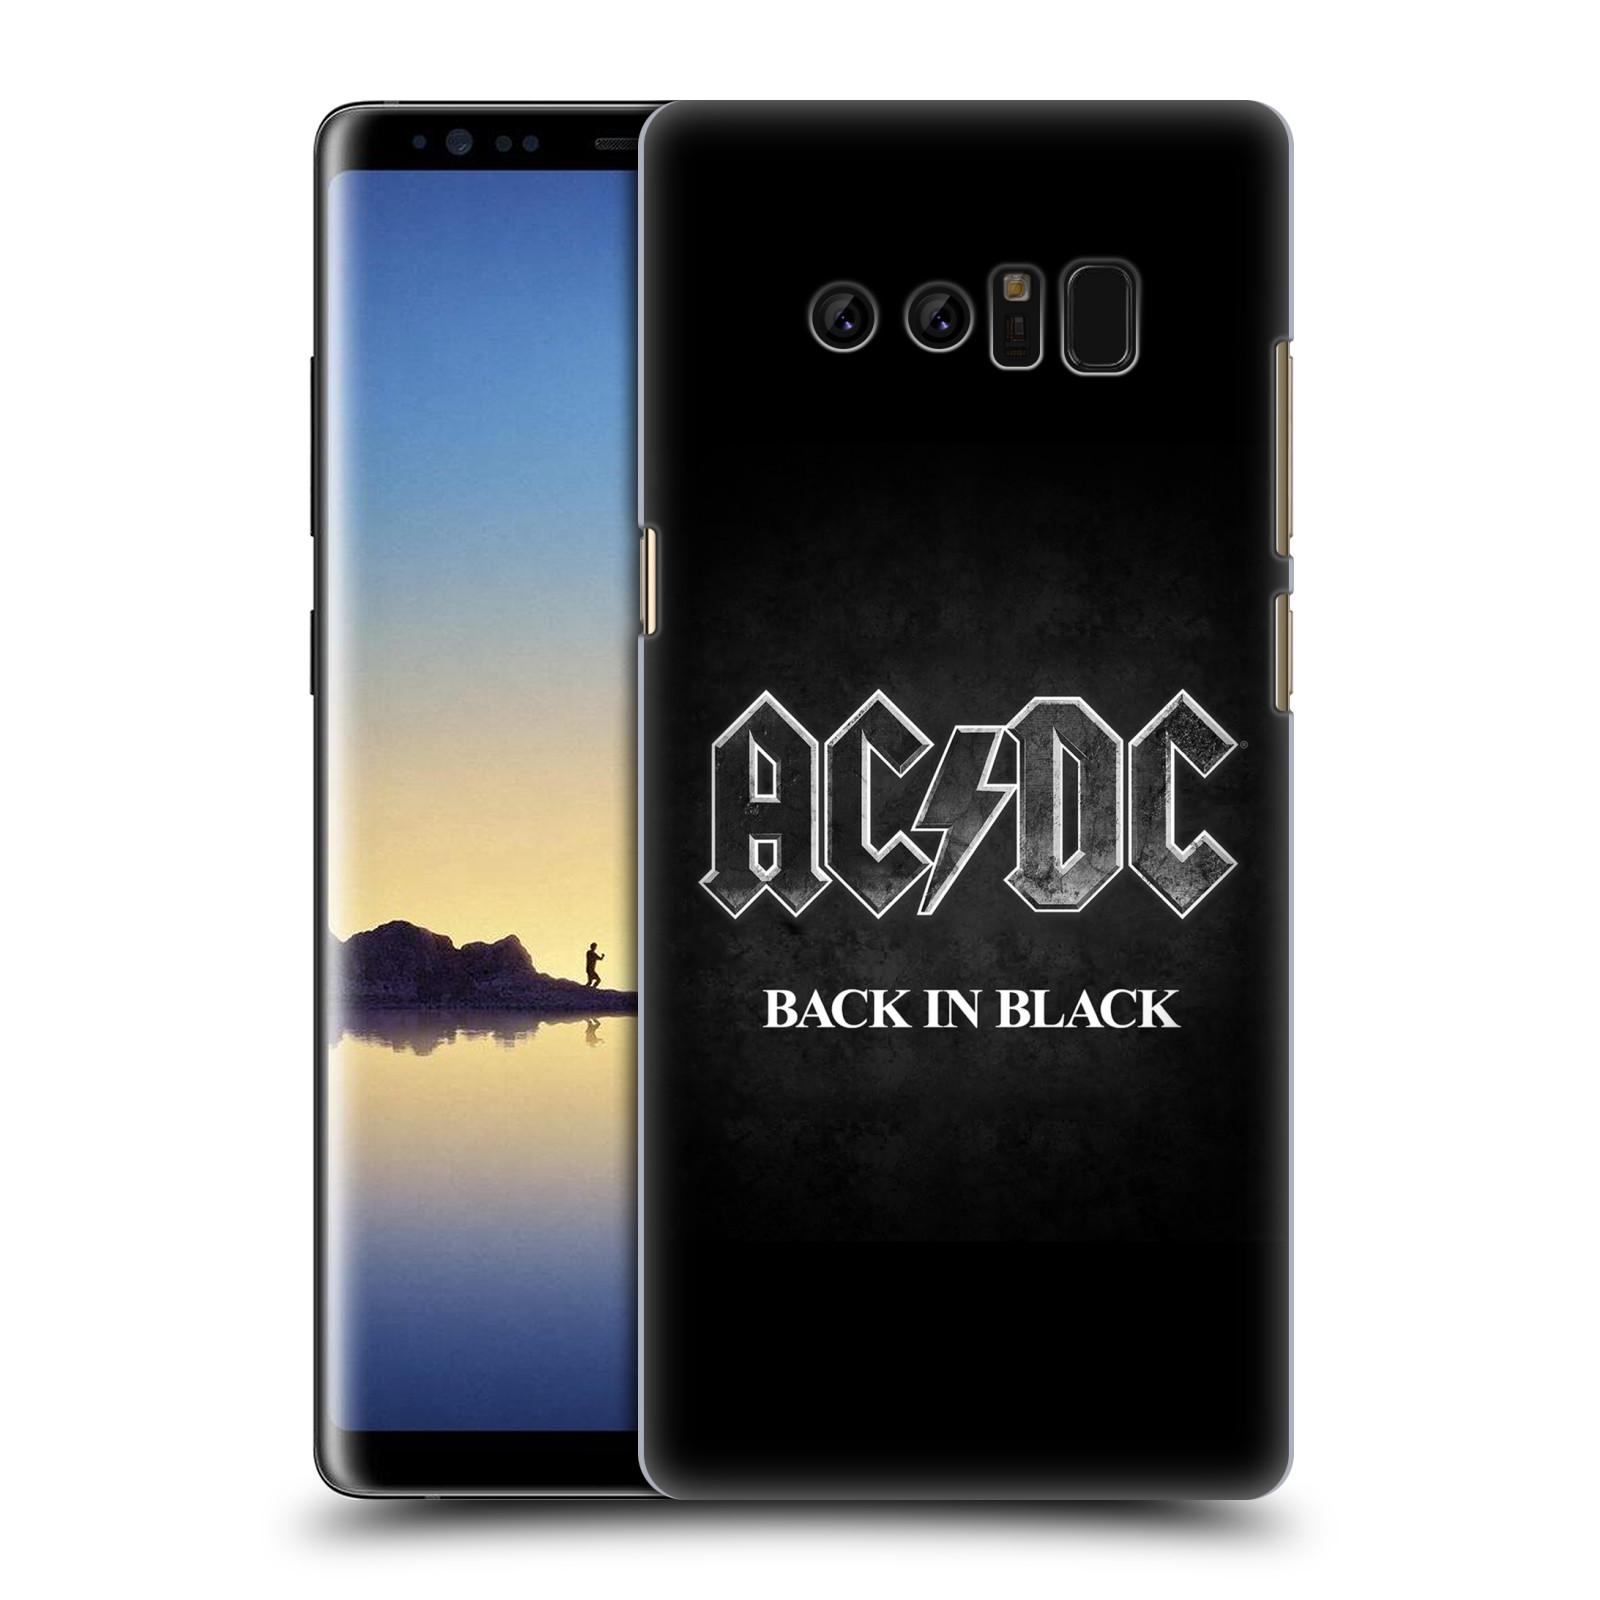 Plastové pouzdro na mobil Samsung Galaxy Note 8 - Head Case - AC/DC BACK IN BLACK (Plastový kryt či obal na mobilní telefon Samsung Galaxy Note 8 SM-N950 s motivem AC/DC BACK IN BLACK)